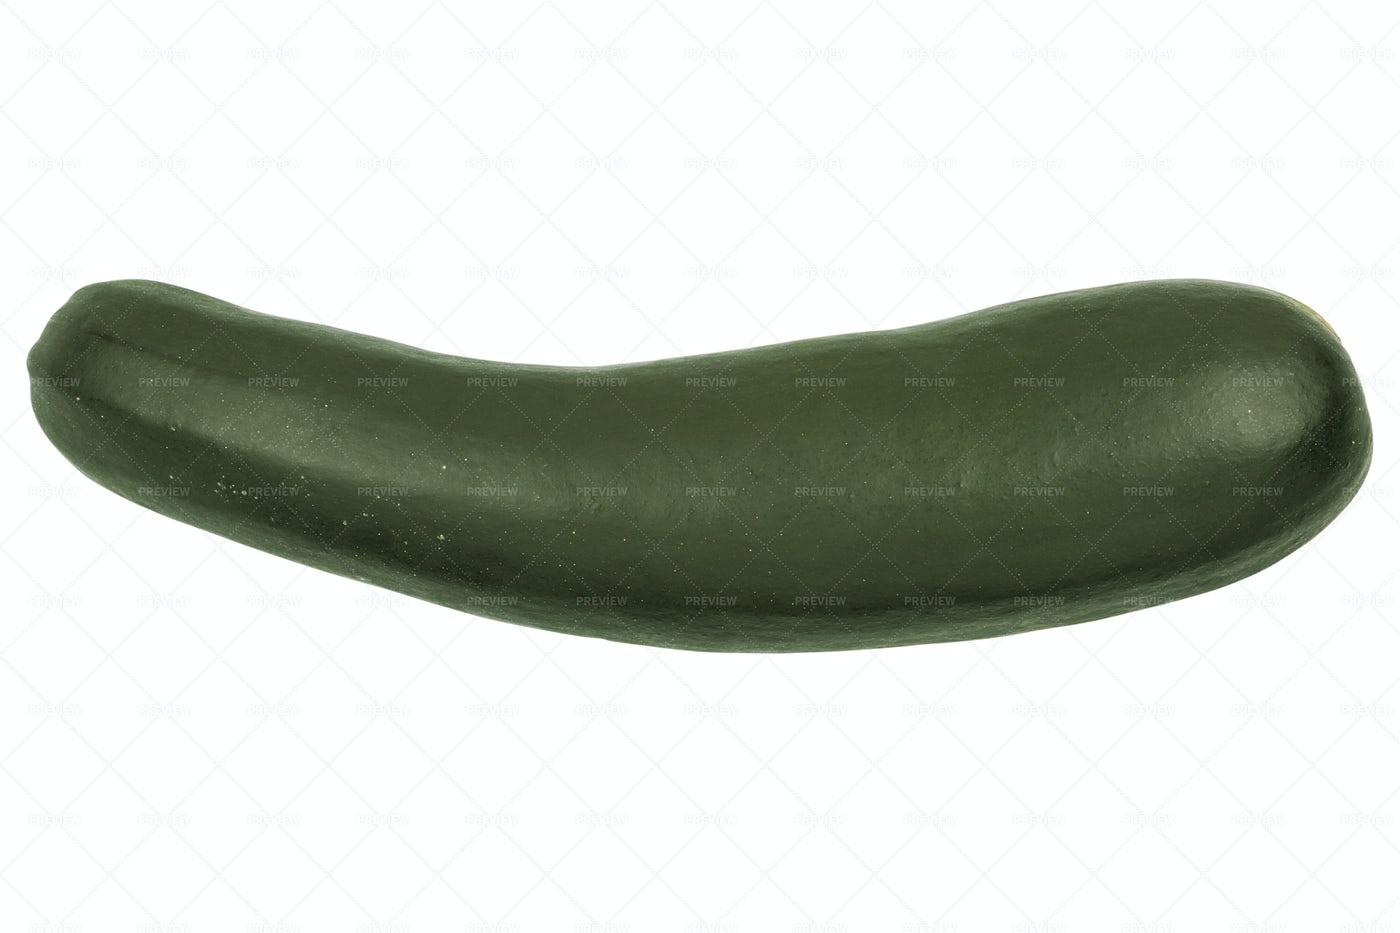 Zucchini On A White Background: Stock Photos